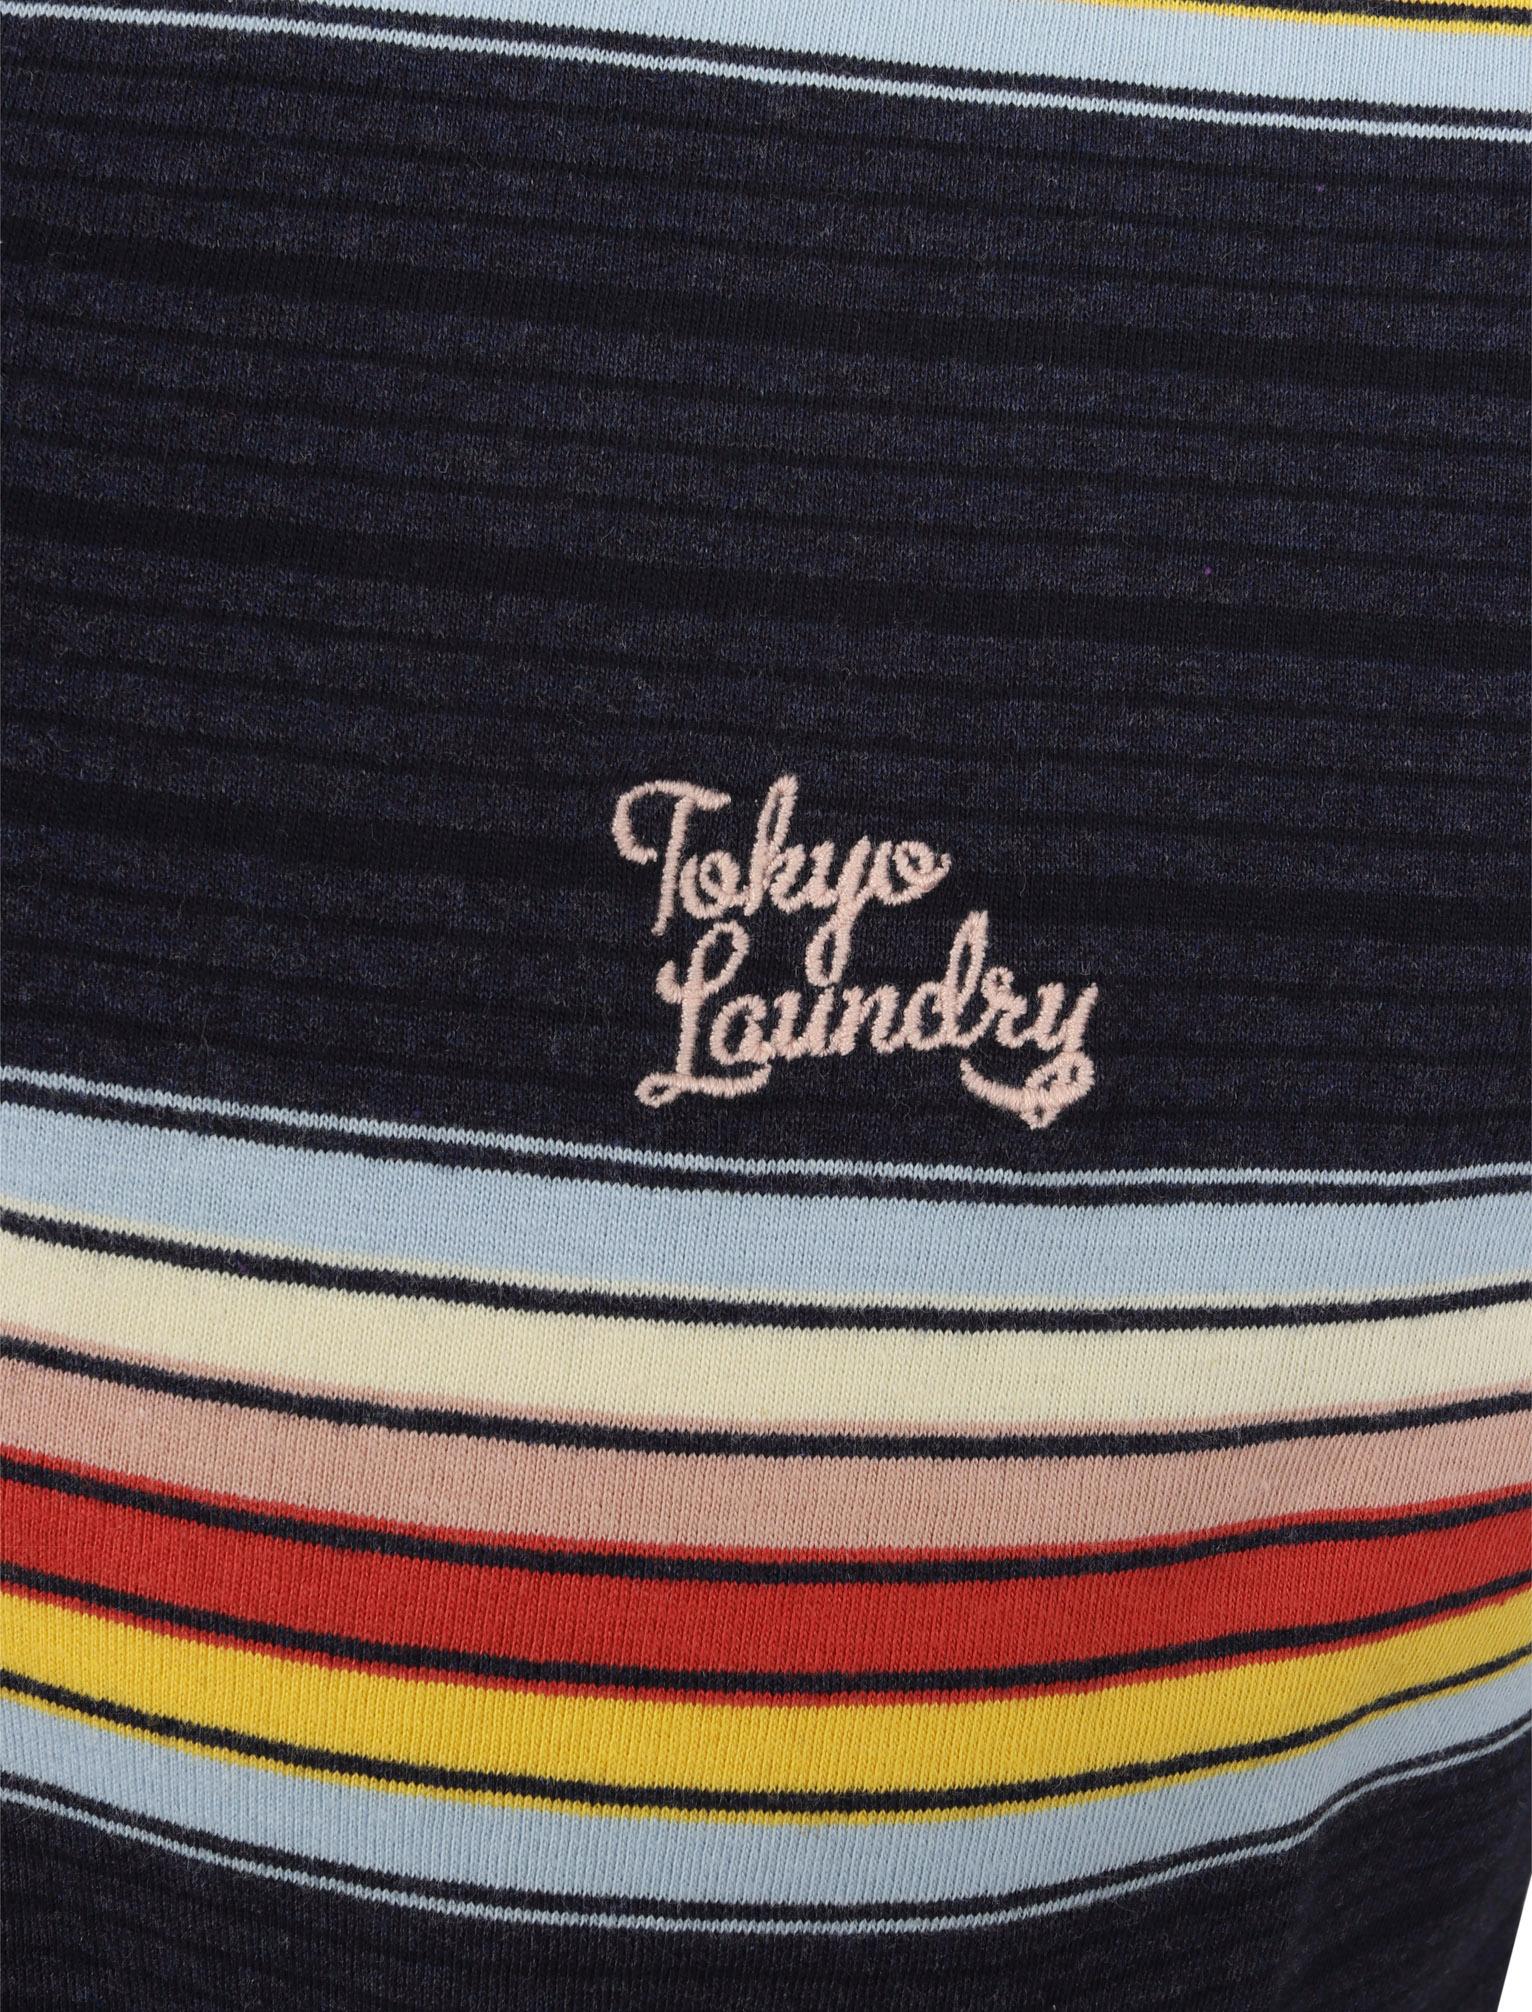 Tokyo-Laundry-Men-039-s-Bakersfield-Striped-Polo-Shirt-Stripy-Retro-Vintage-T-Shirt thumbnail 4